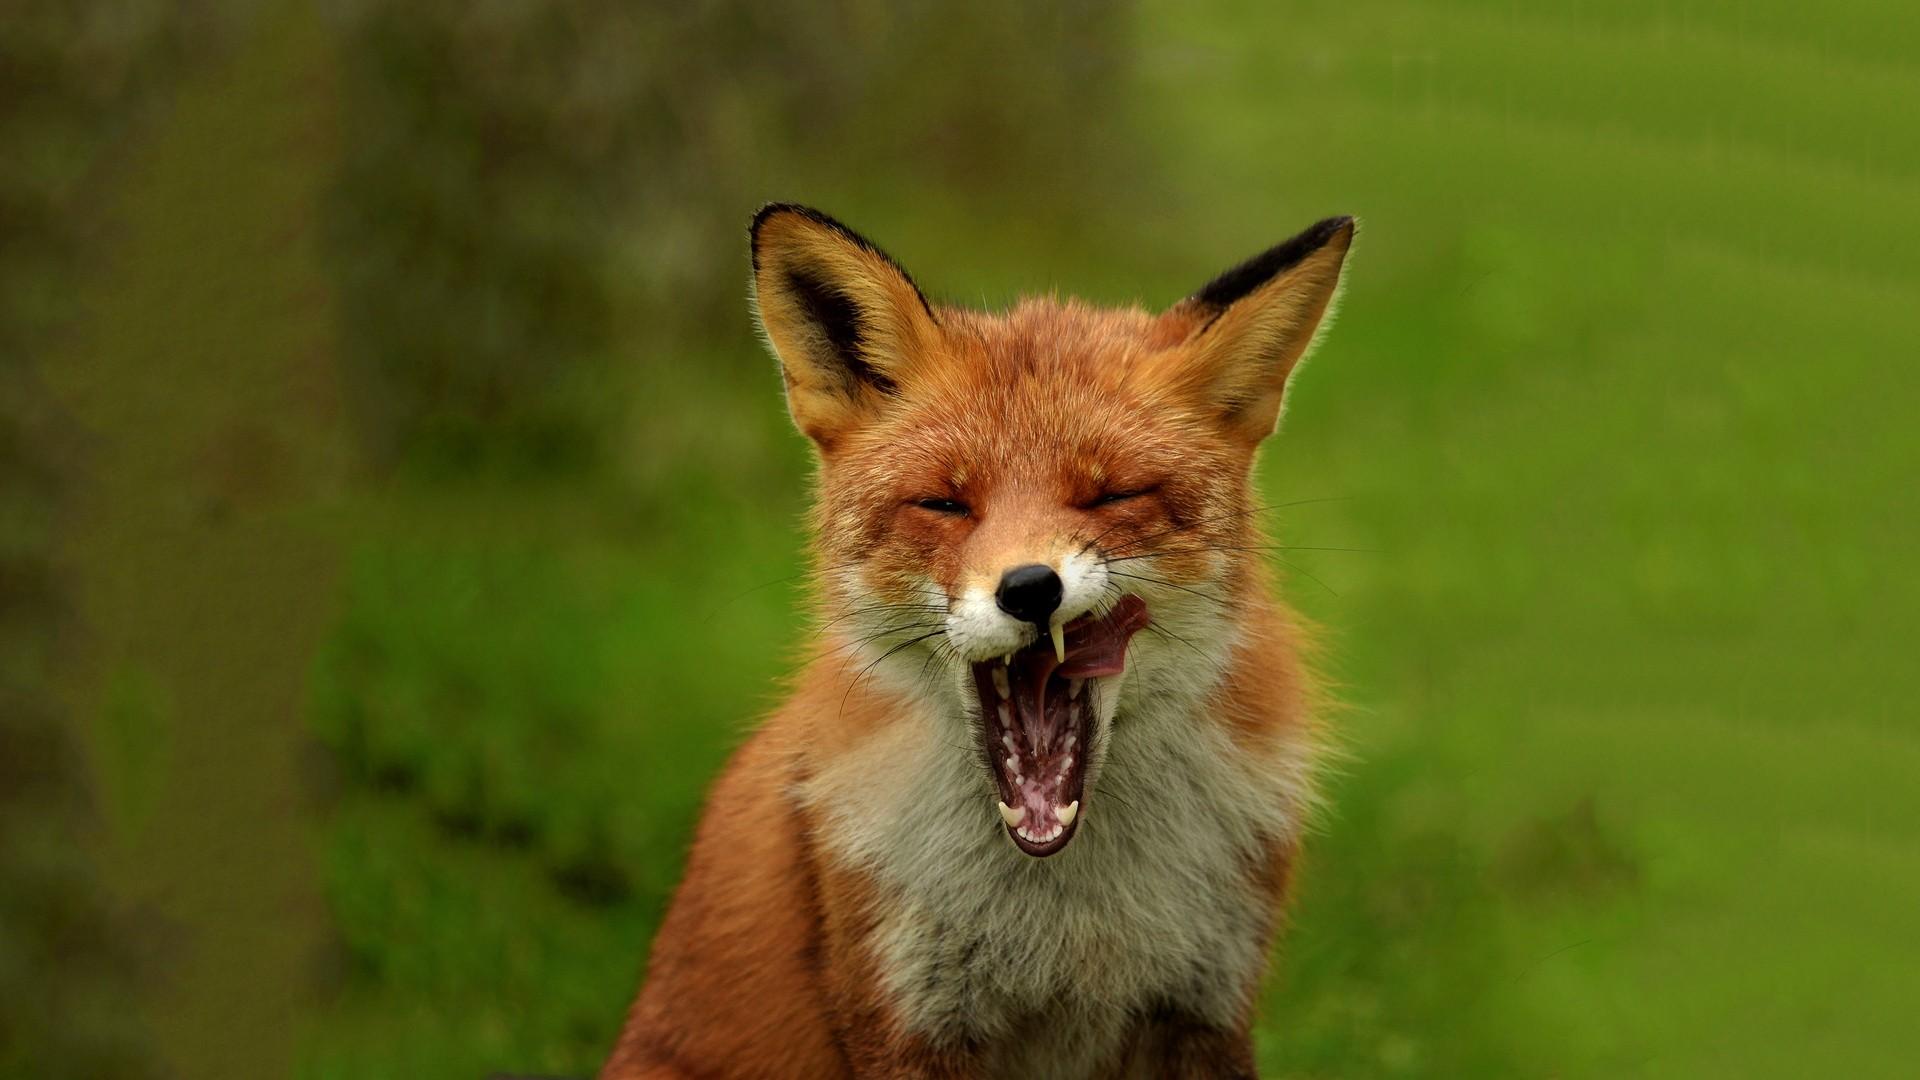 Fox High Quality